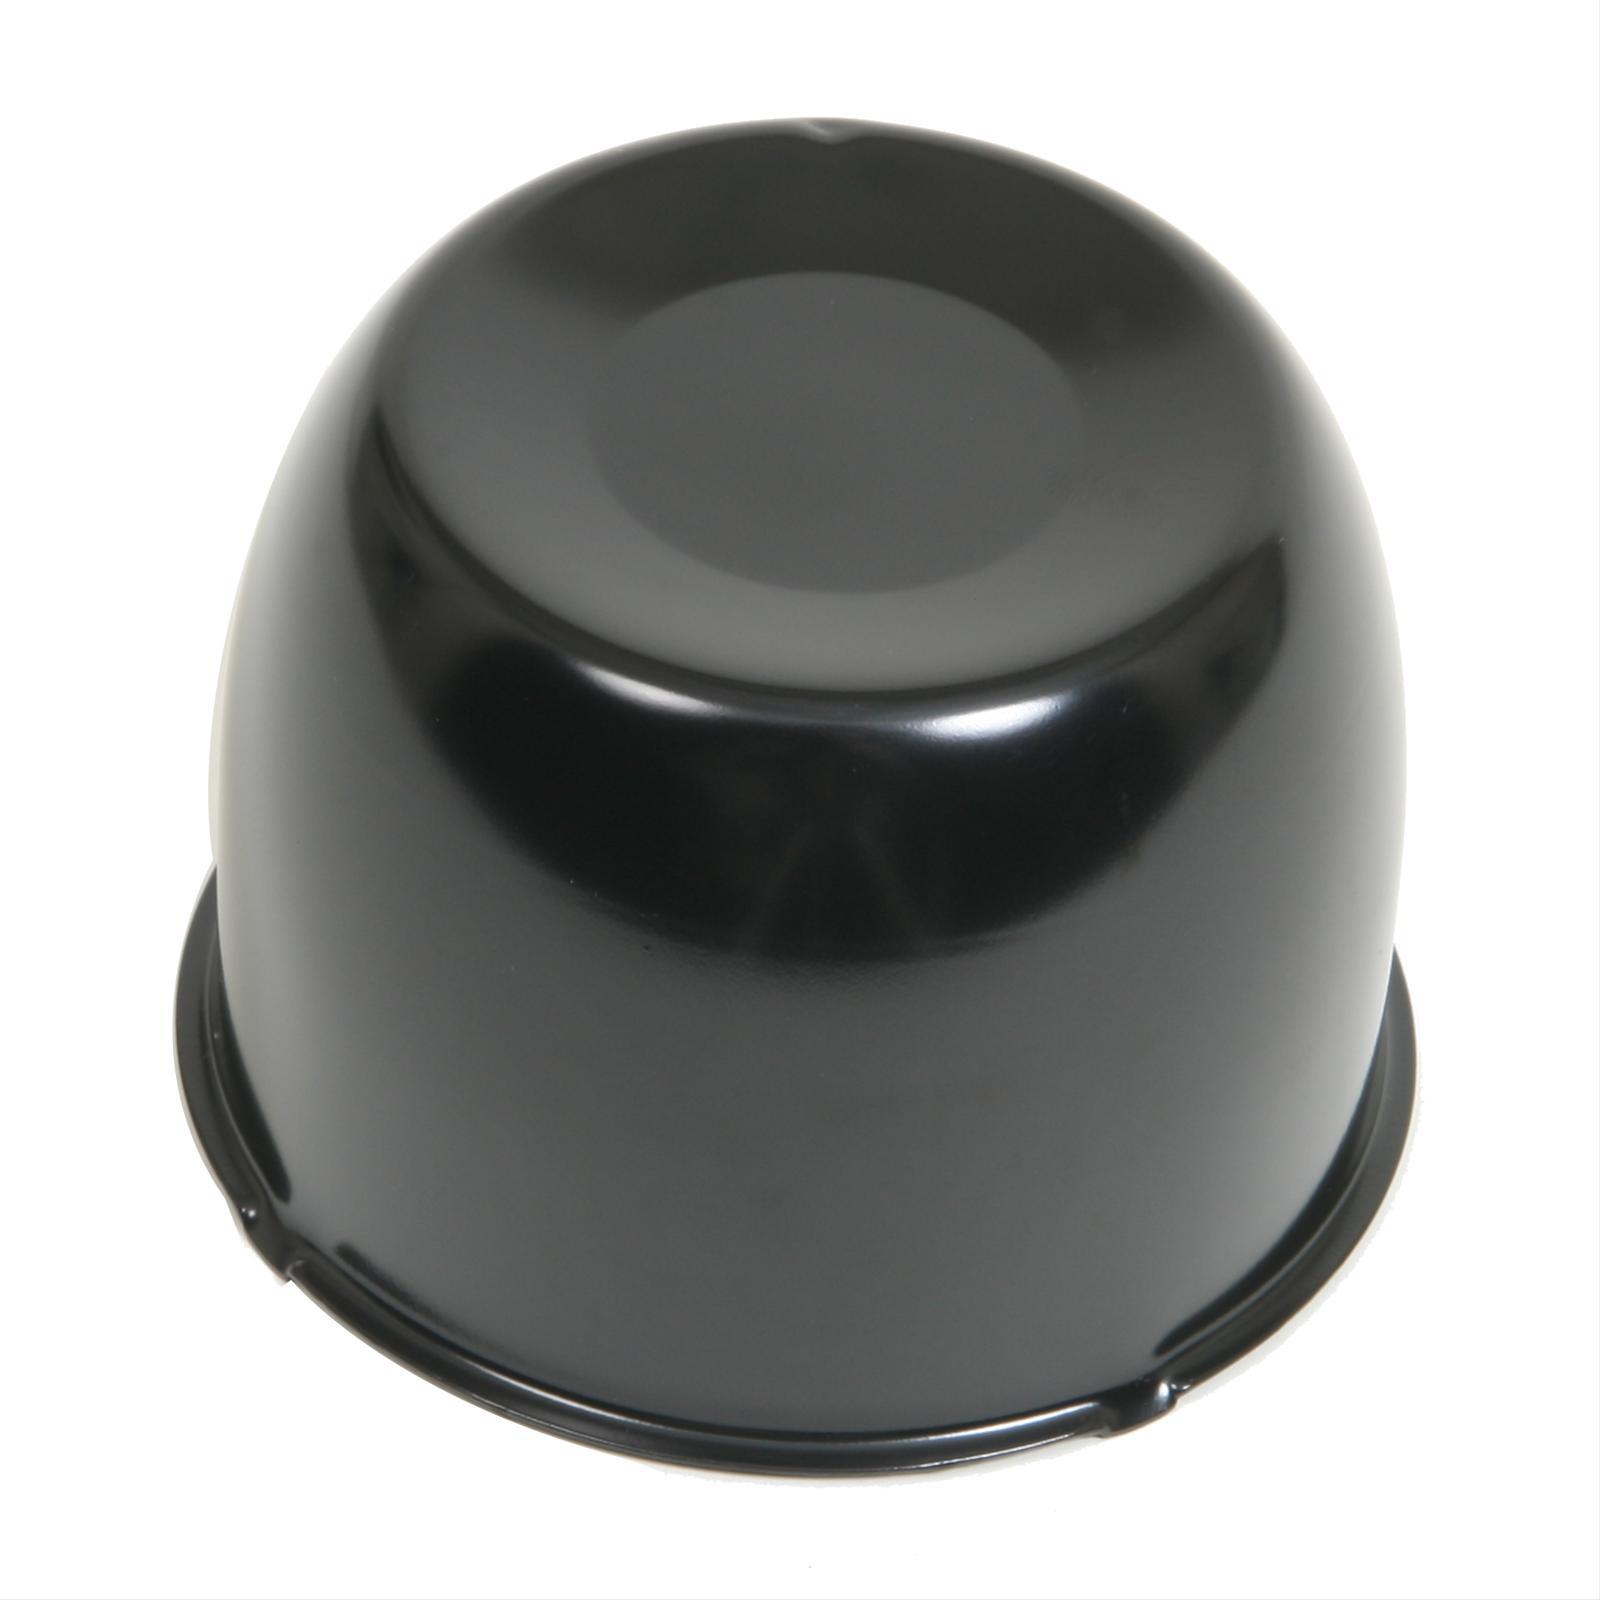 gorilla automotive hc202stbc center cap closed end dia 3 tall black 12619610006 ebay. Black Bedroom Furniture Sets. Home Design Ideas